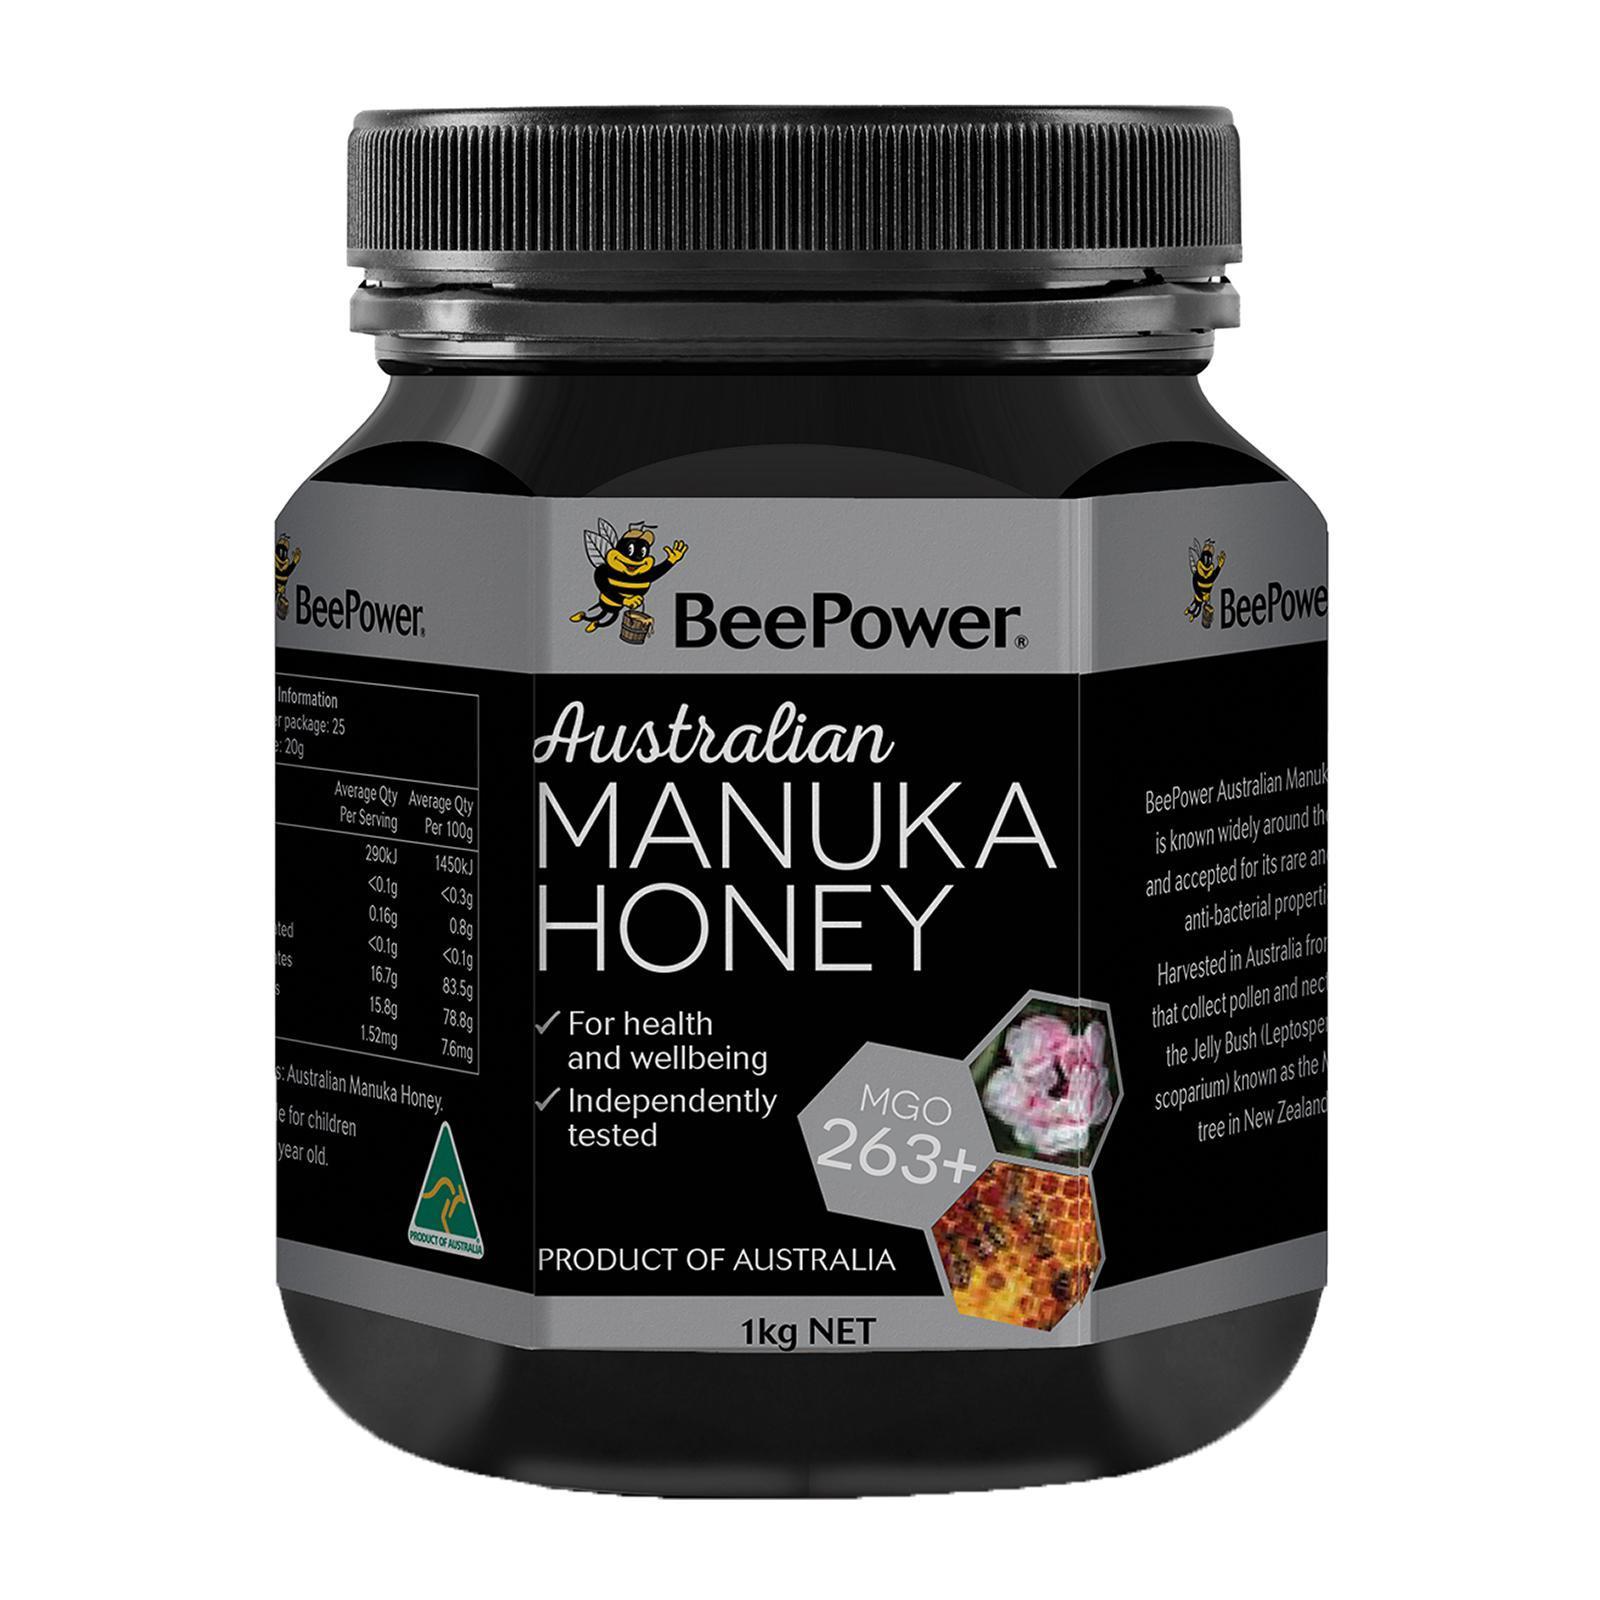 BeePower Australian Manuka Honey MGO 263+ - By Nature's Nutrition